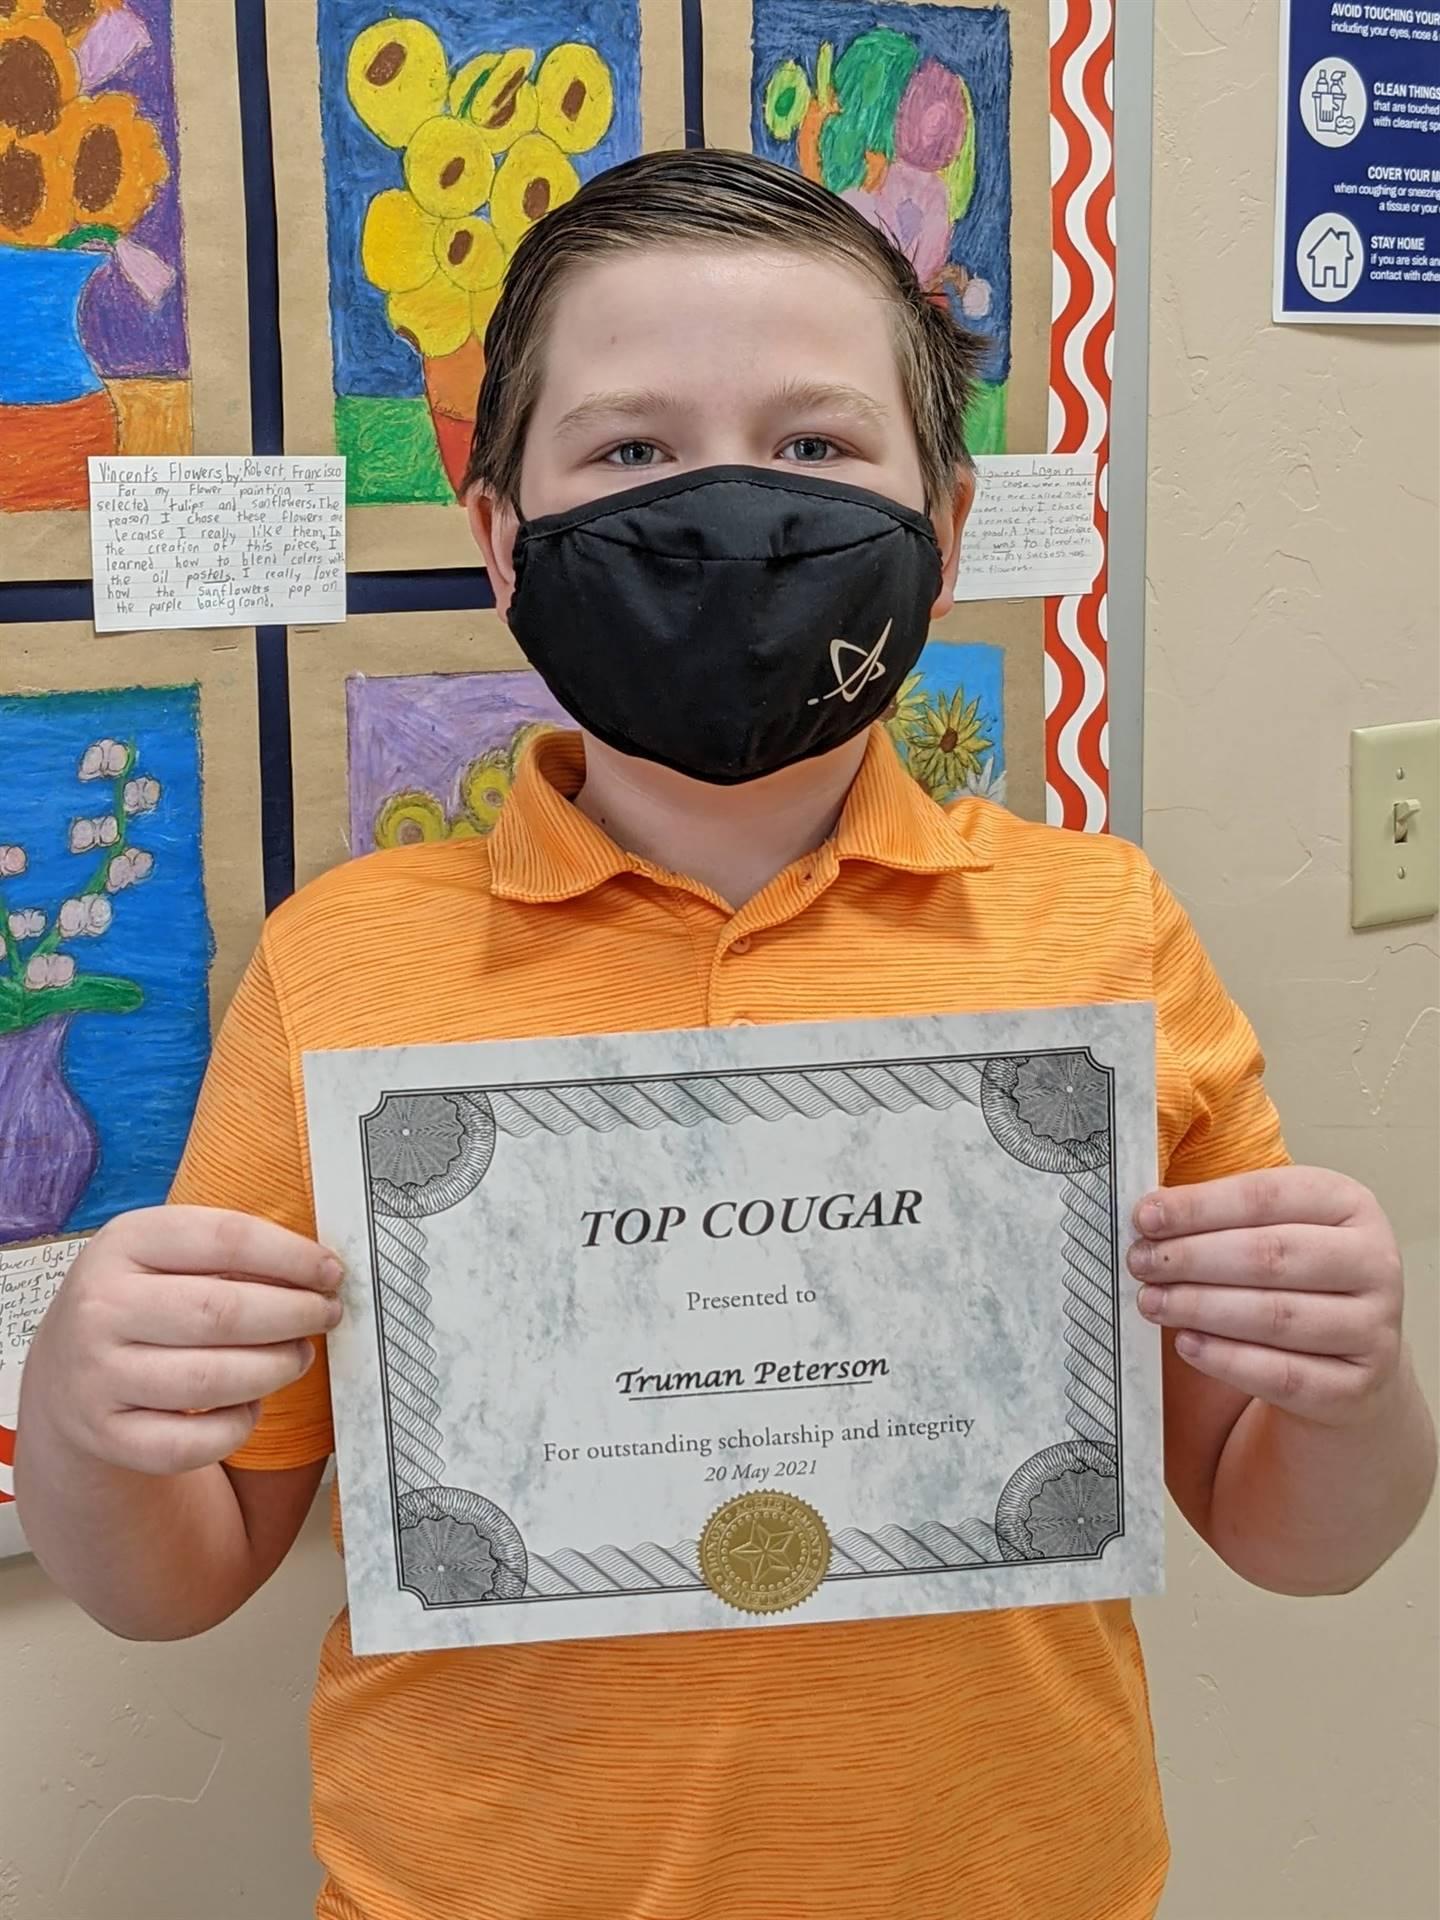 Top Cougar Award